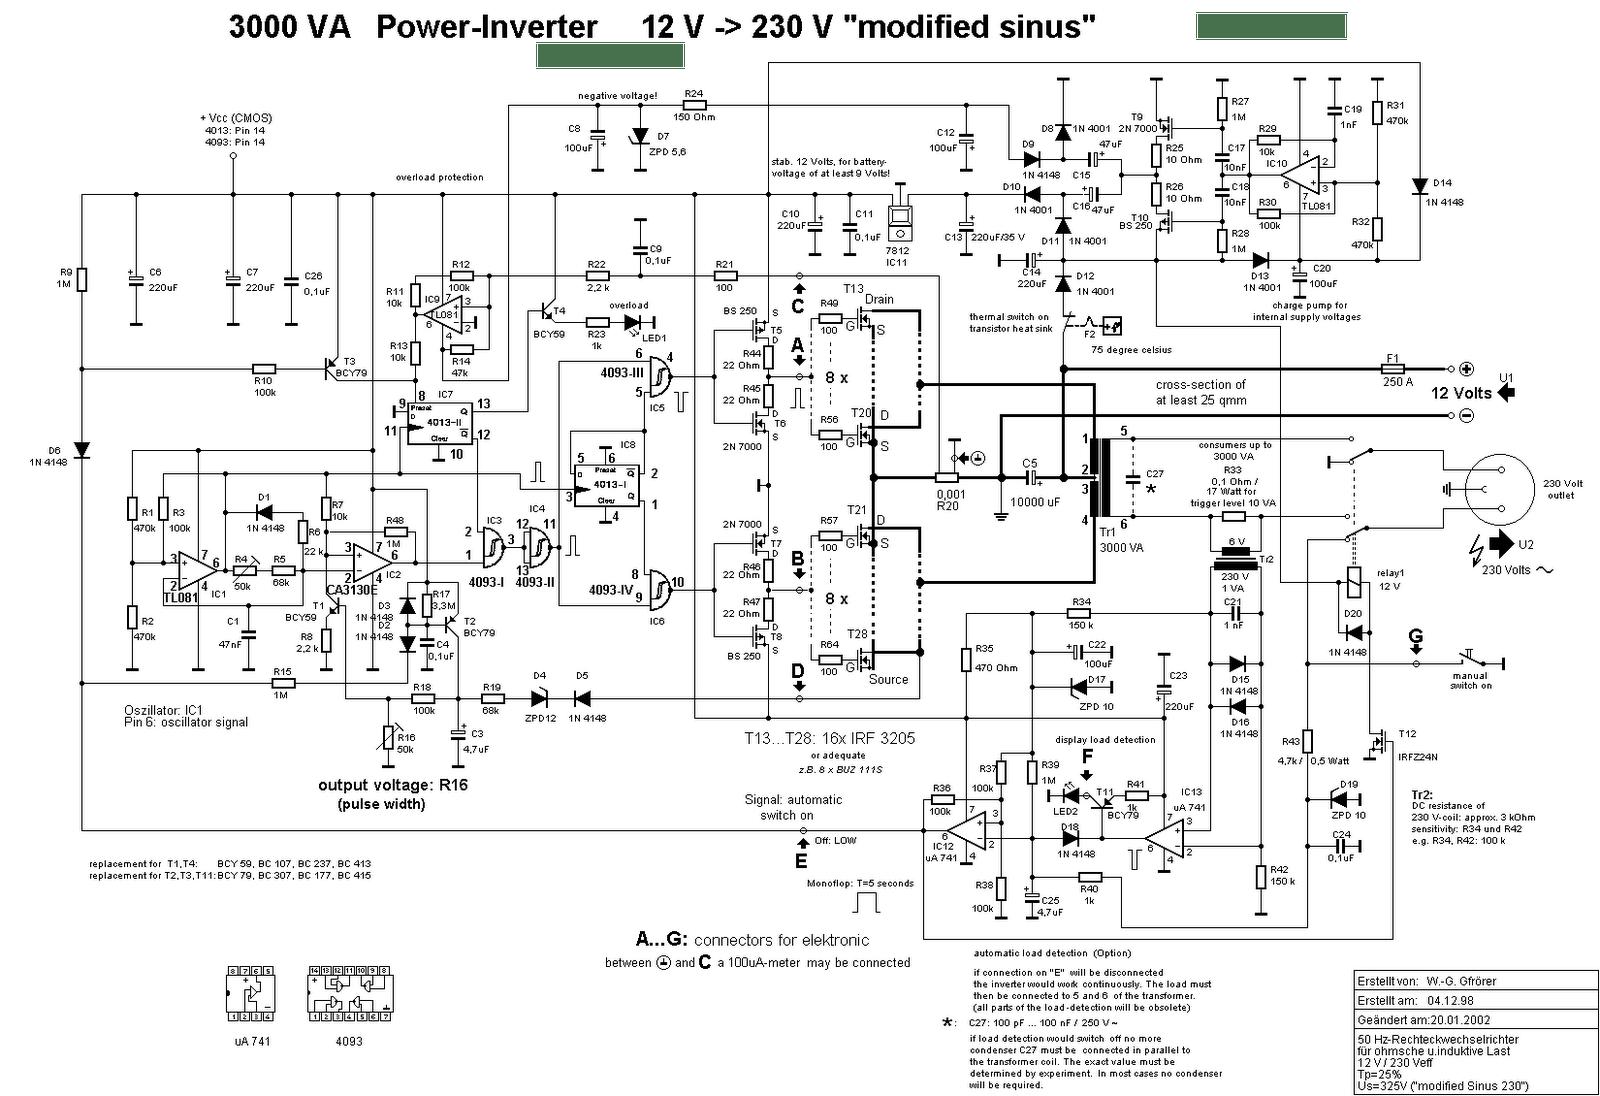 circuit diagram sine wave 24v 230v ac